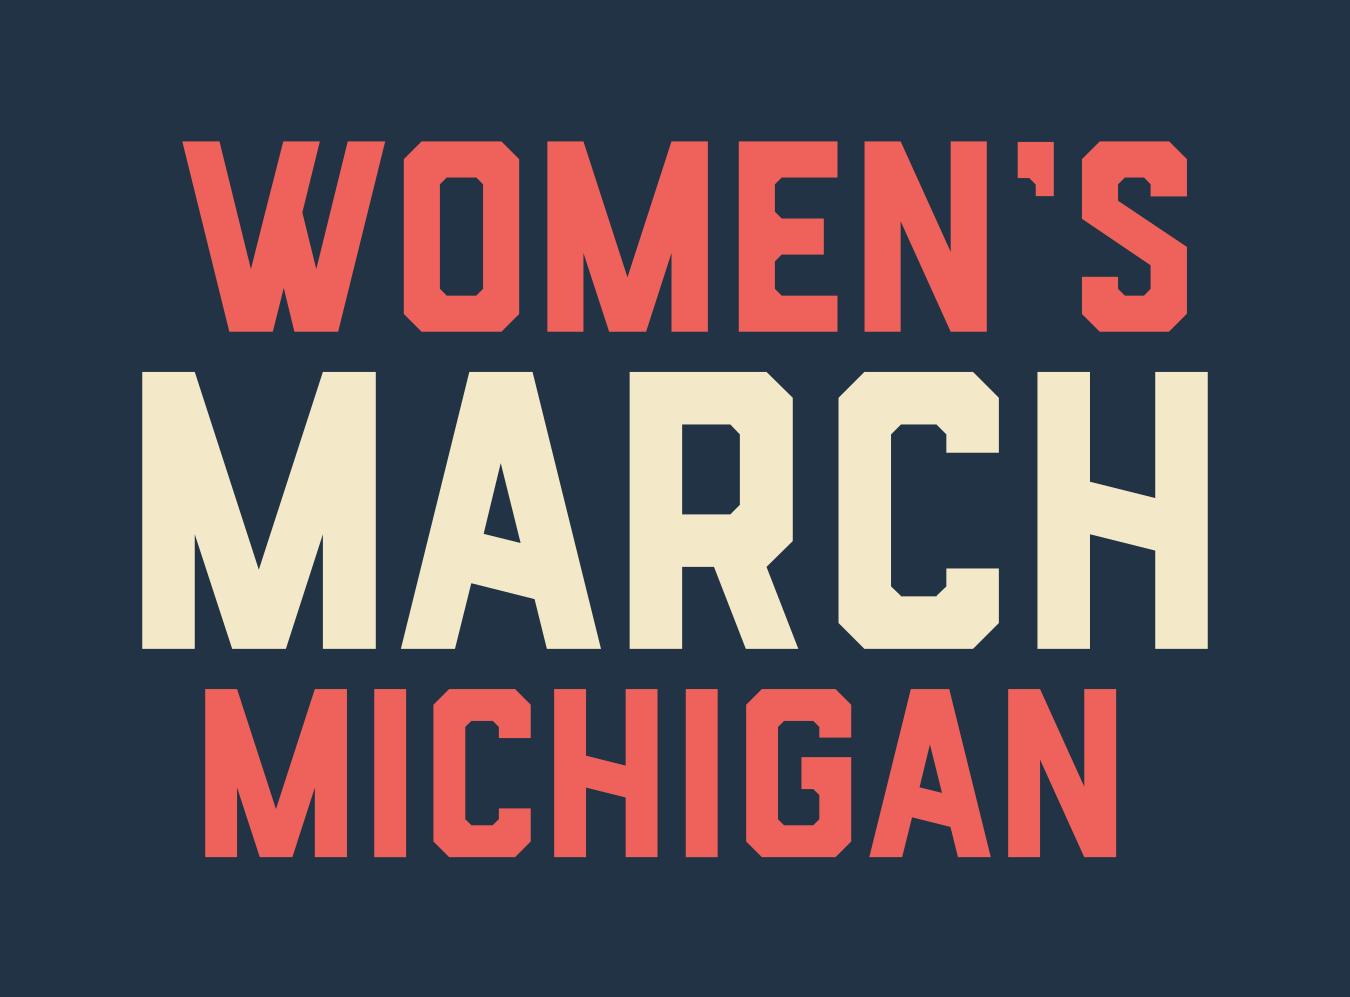 Copy of Women's March Michigan